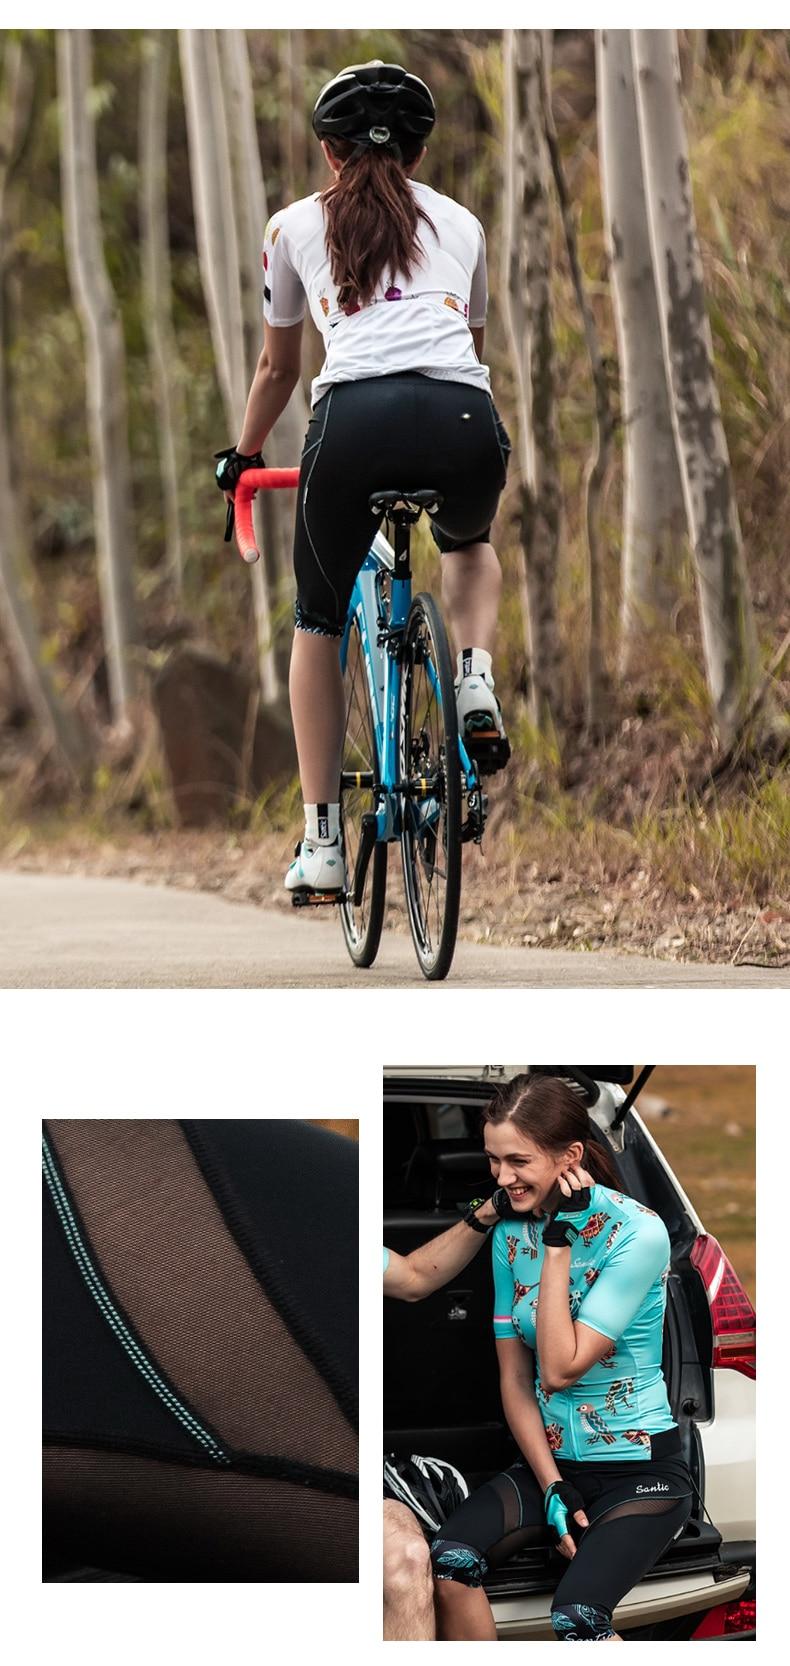 2018 Santic Cycling Shorts Women MTB Shorts Downhill Bike Shorts Bicycle Short Hollow Out Road Sport Cycling 34 Shorts Mesh (13)